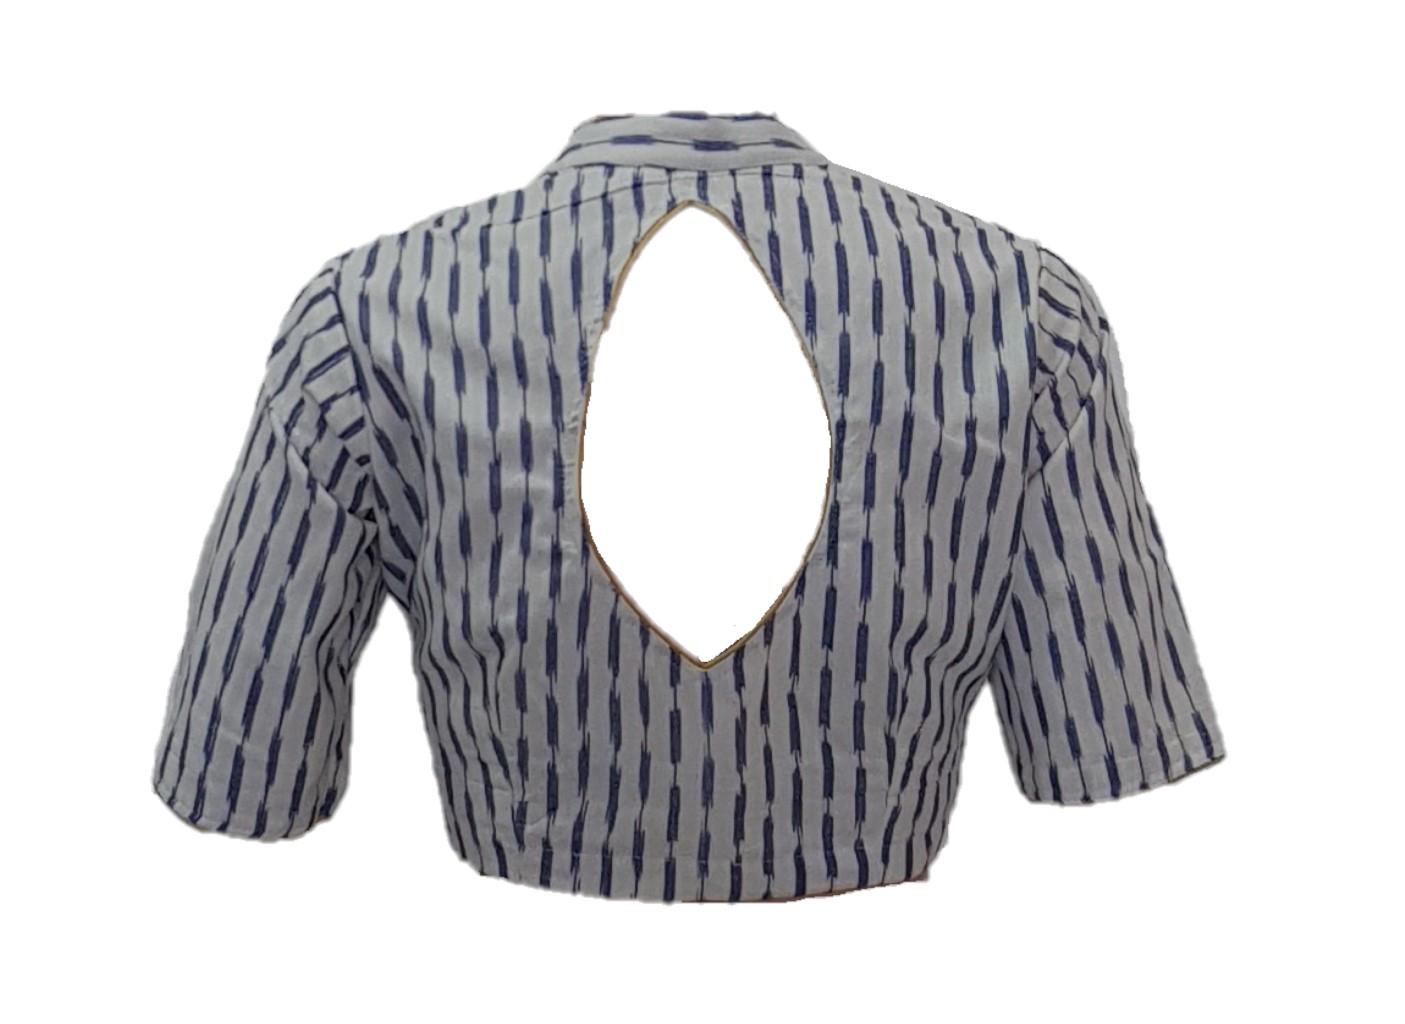 Pochampally Ikat Cotton Fabric Stand Collar Readymade Saree Blouse WhiteBlue  : Picture